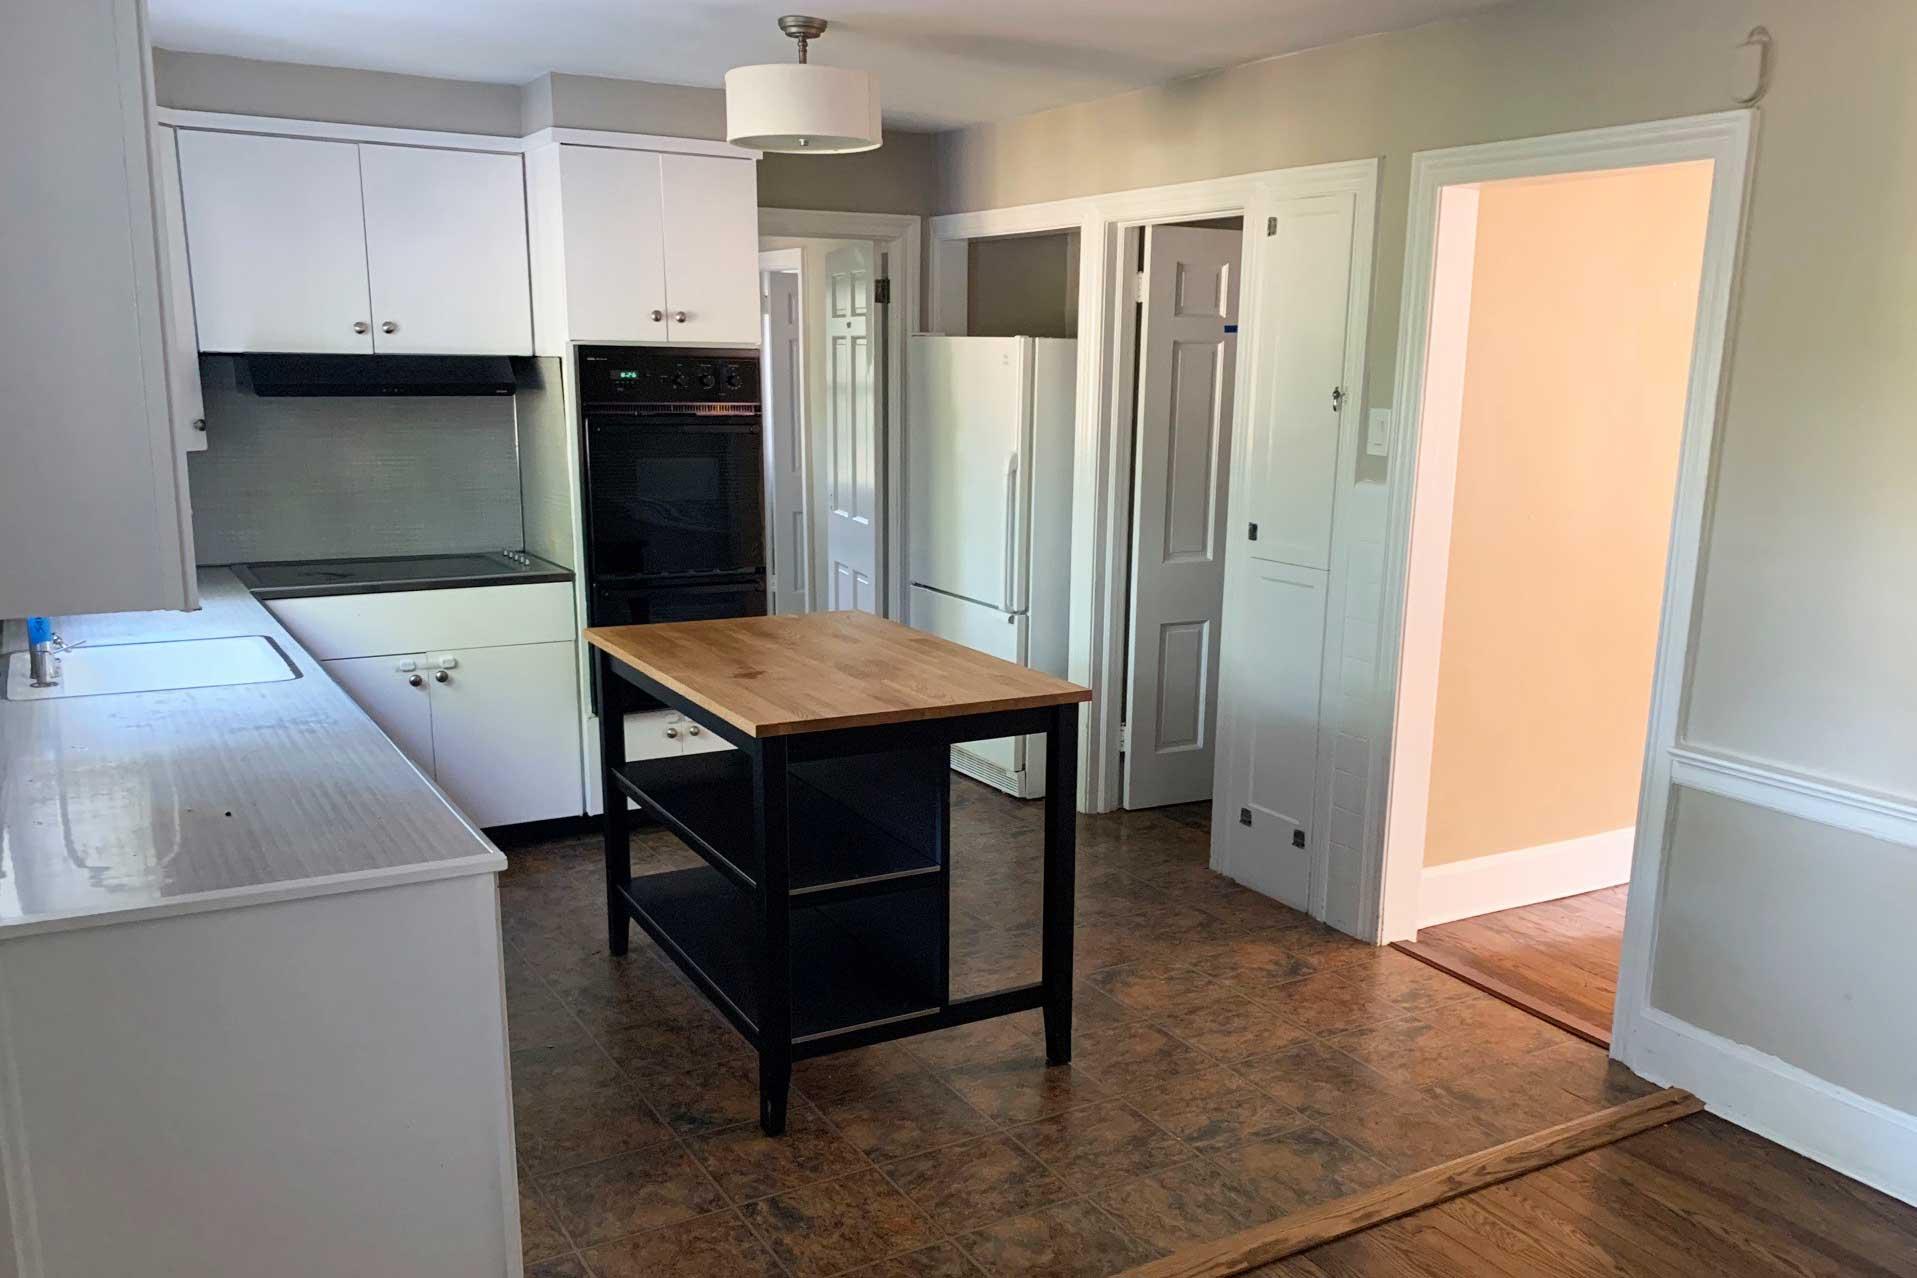 Maplewood NJ kitchen renovation story